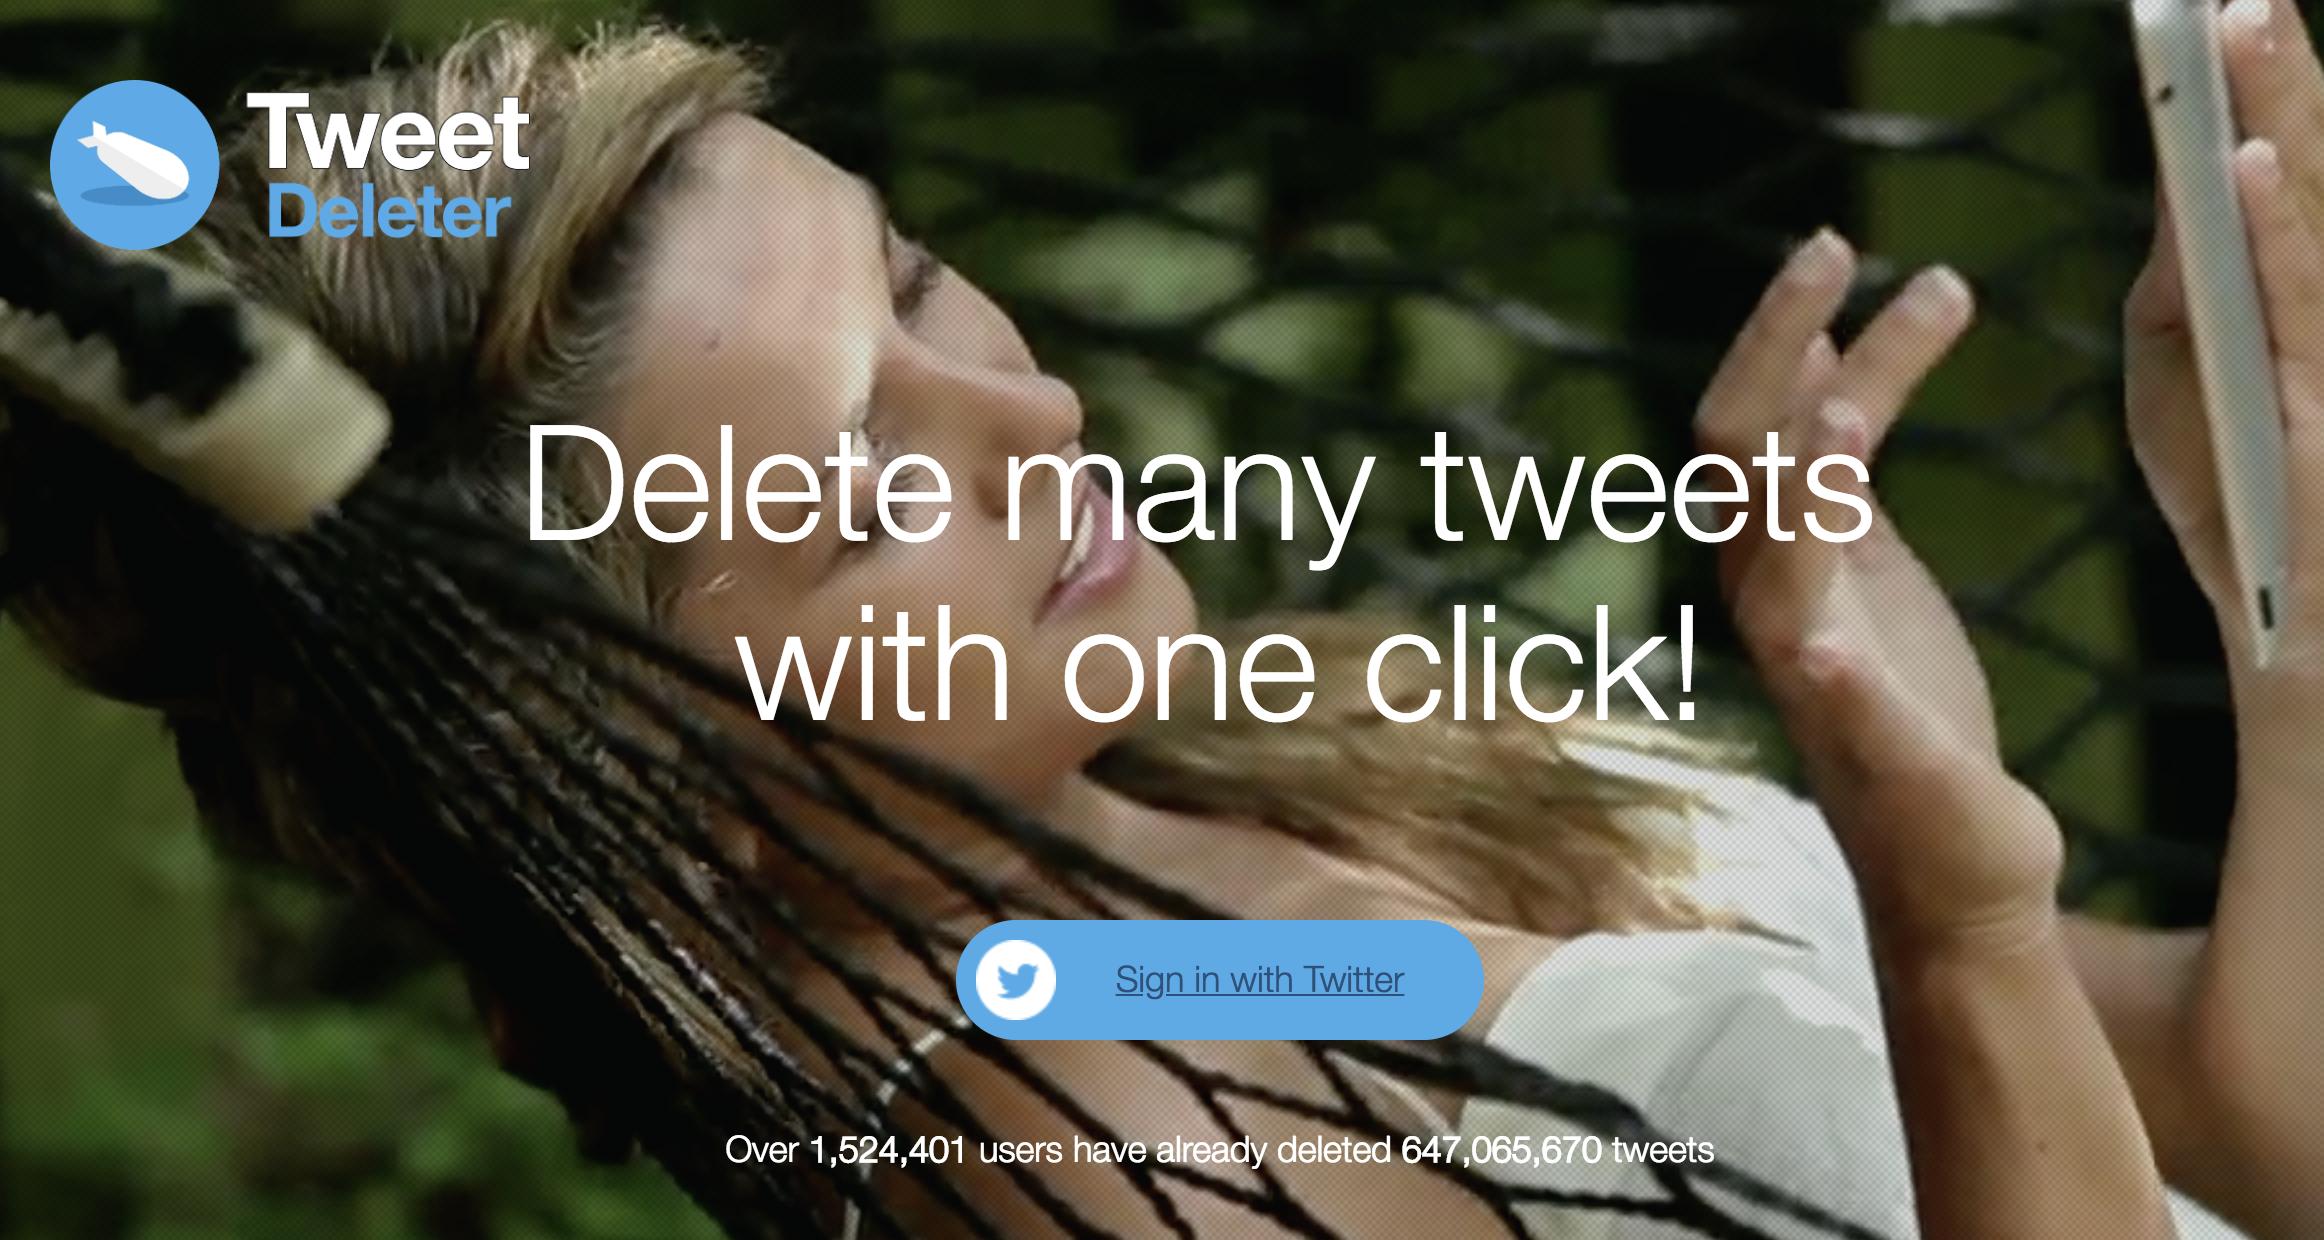 Tweet Deleter tool